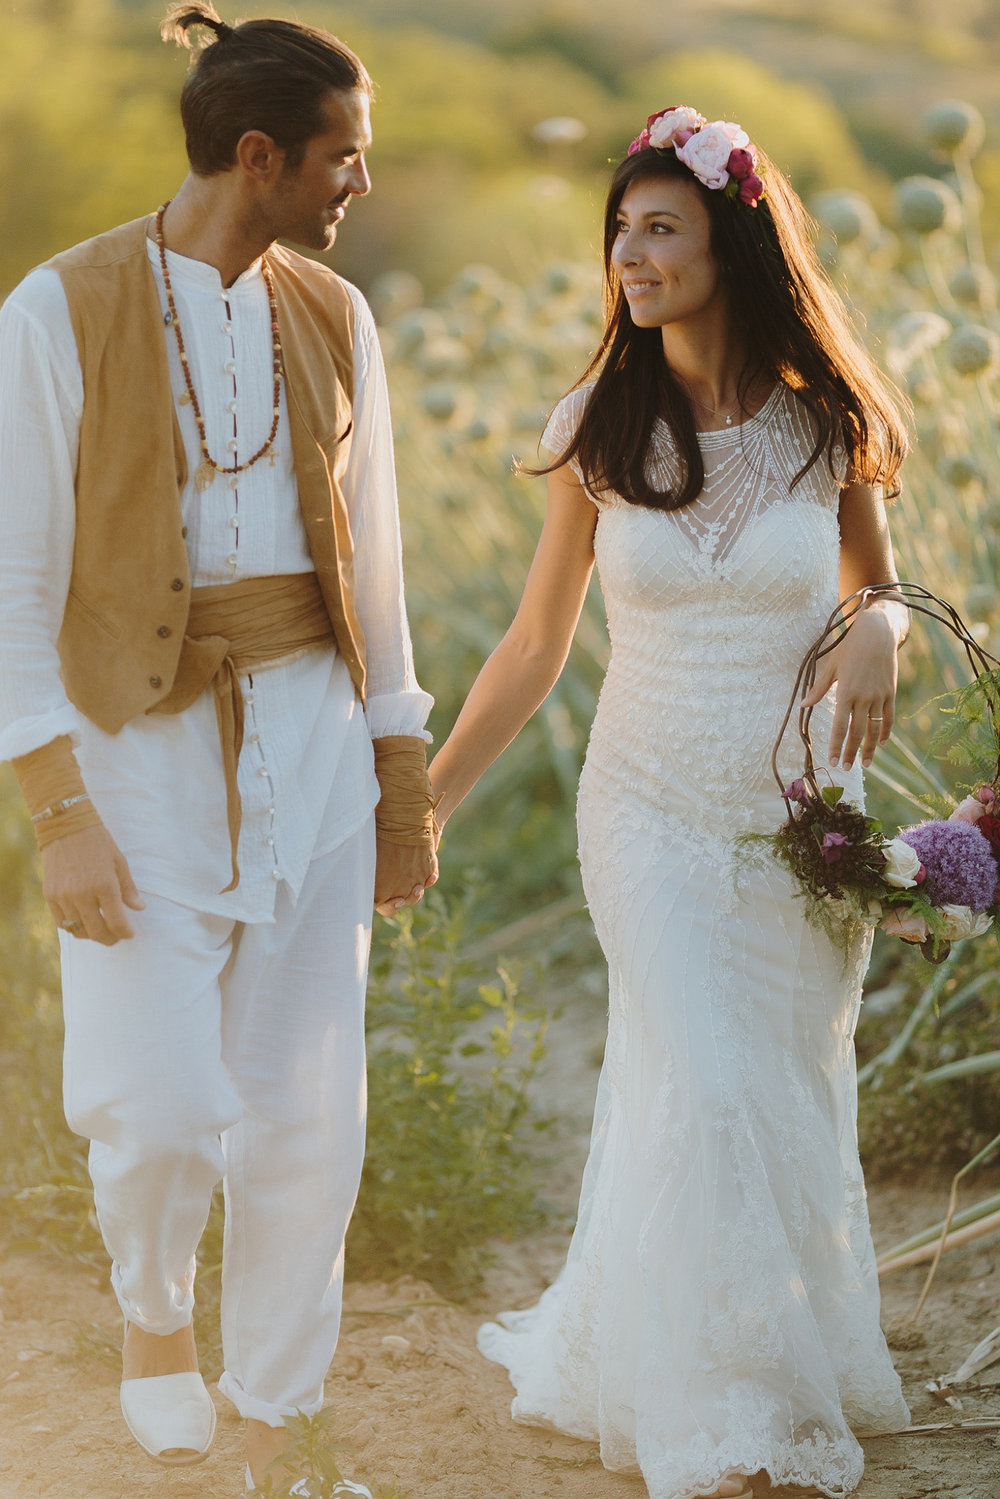 a_F_86__IMG_4523_86_gipsy_wedding_hemp_field_coriano_Rimini_scollina_vintage_destinationwedding_destinationphotographer_paolomanzi_1500